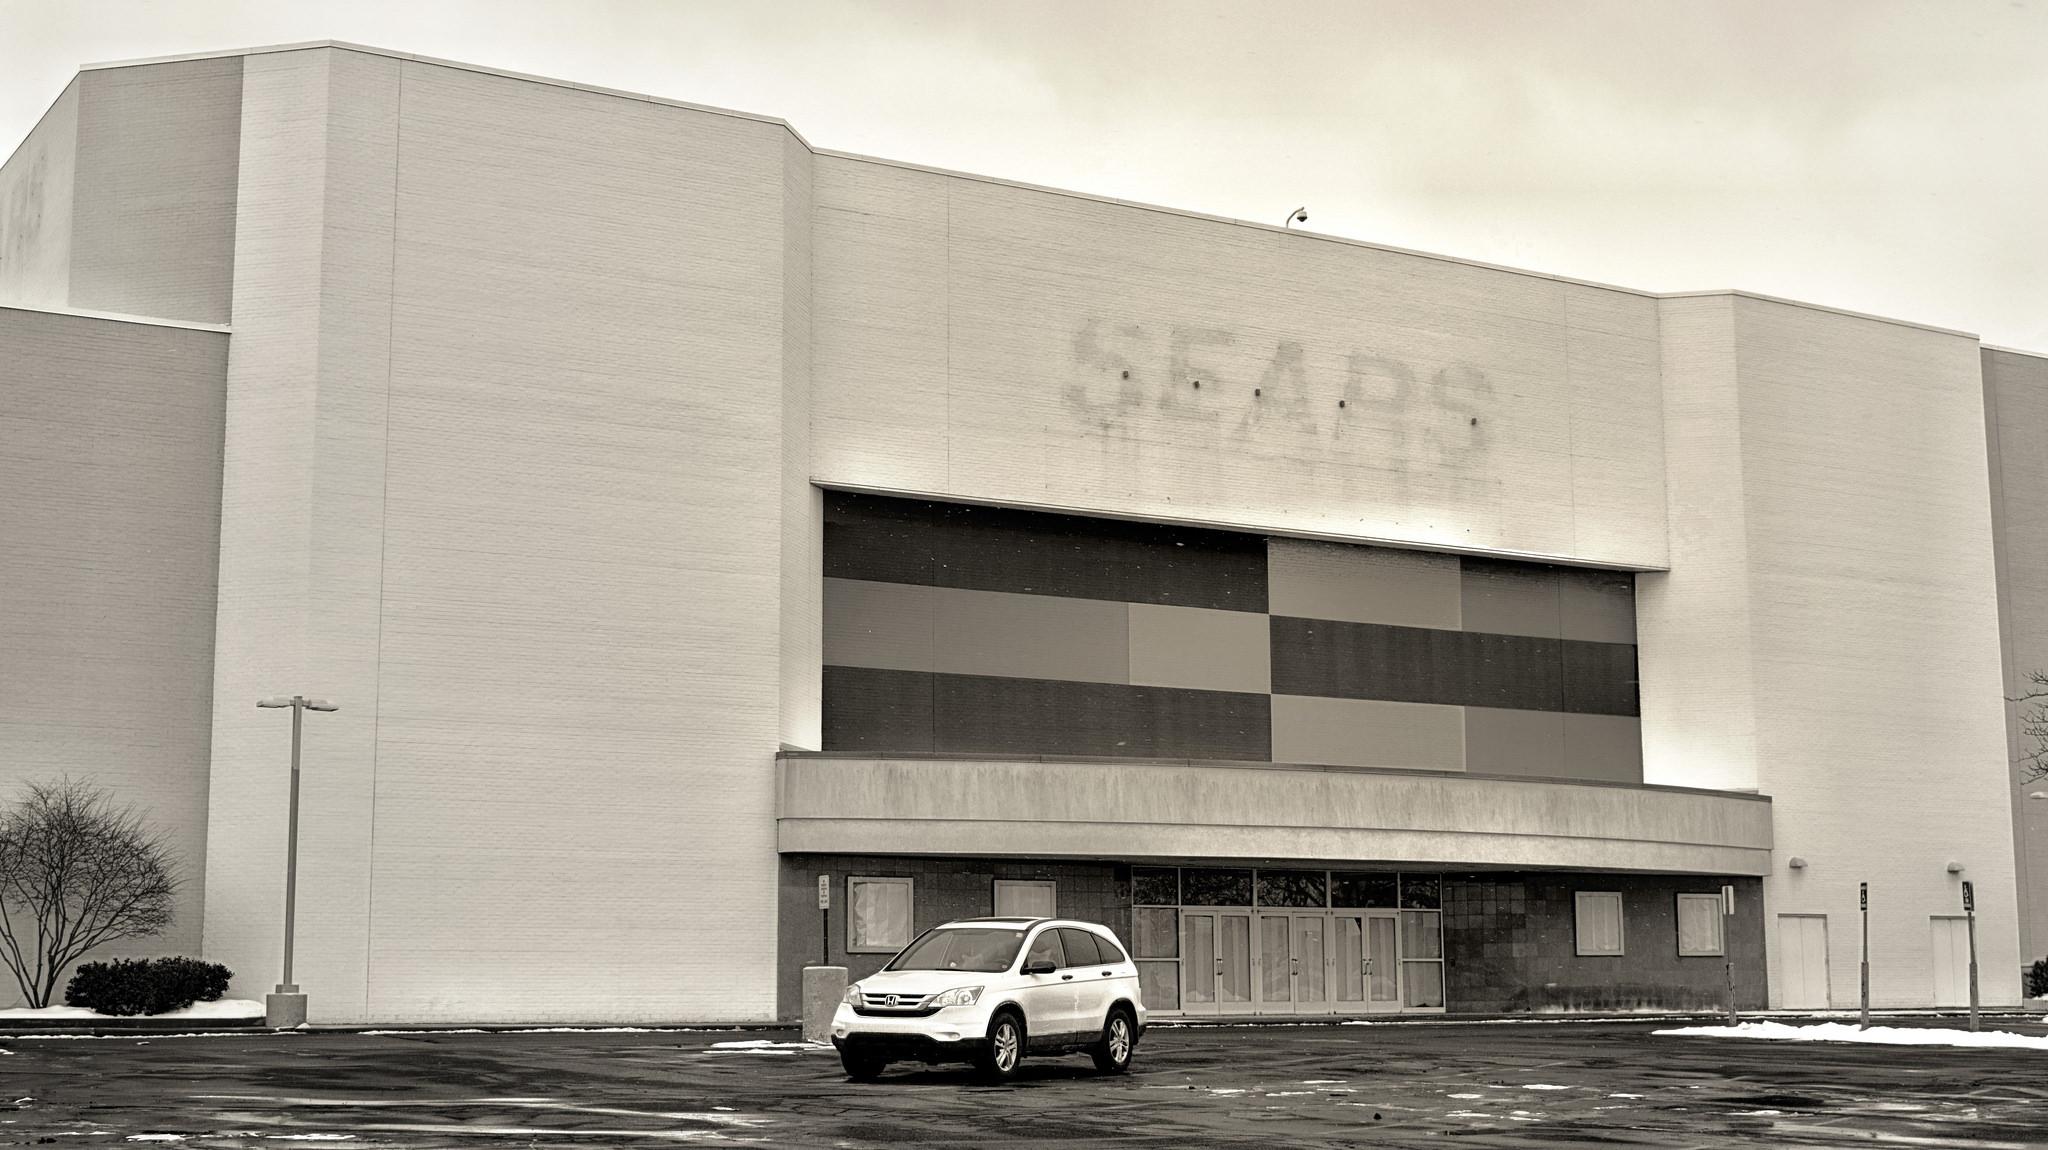 Sears Holdings Consumerist